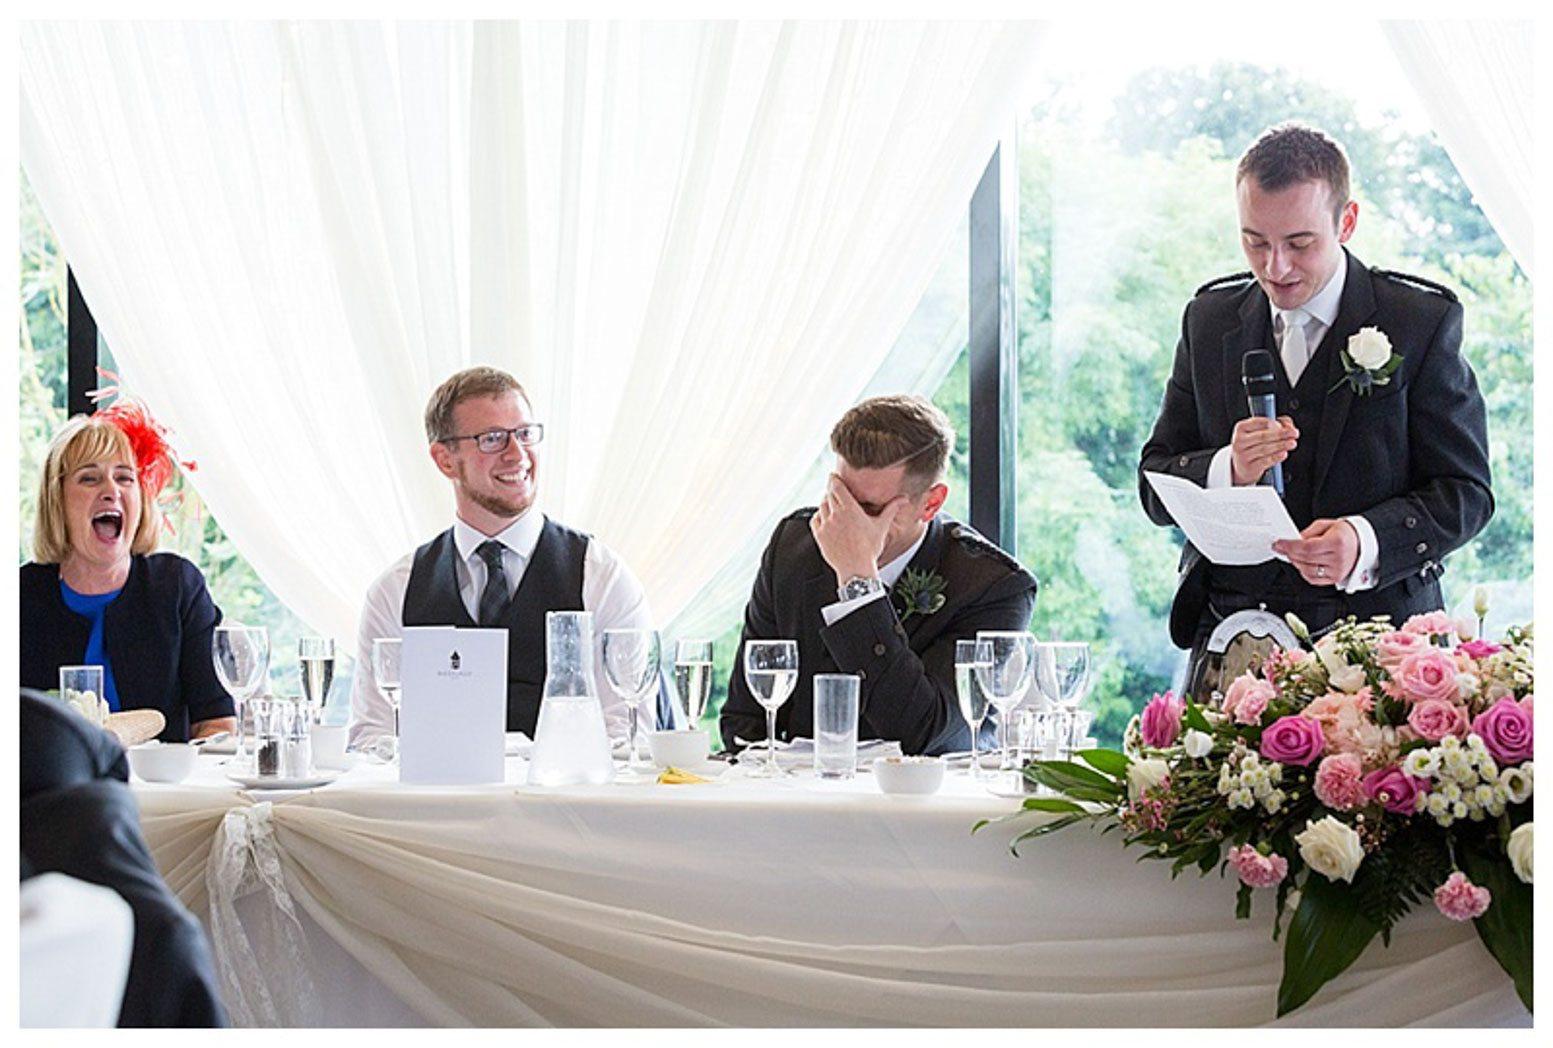 Ballygally Castle Wedding Photographs by Ricky Parker Photography-52